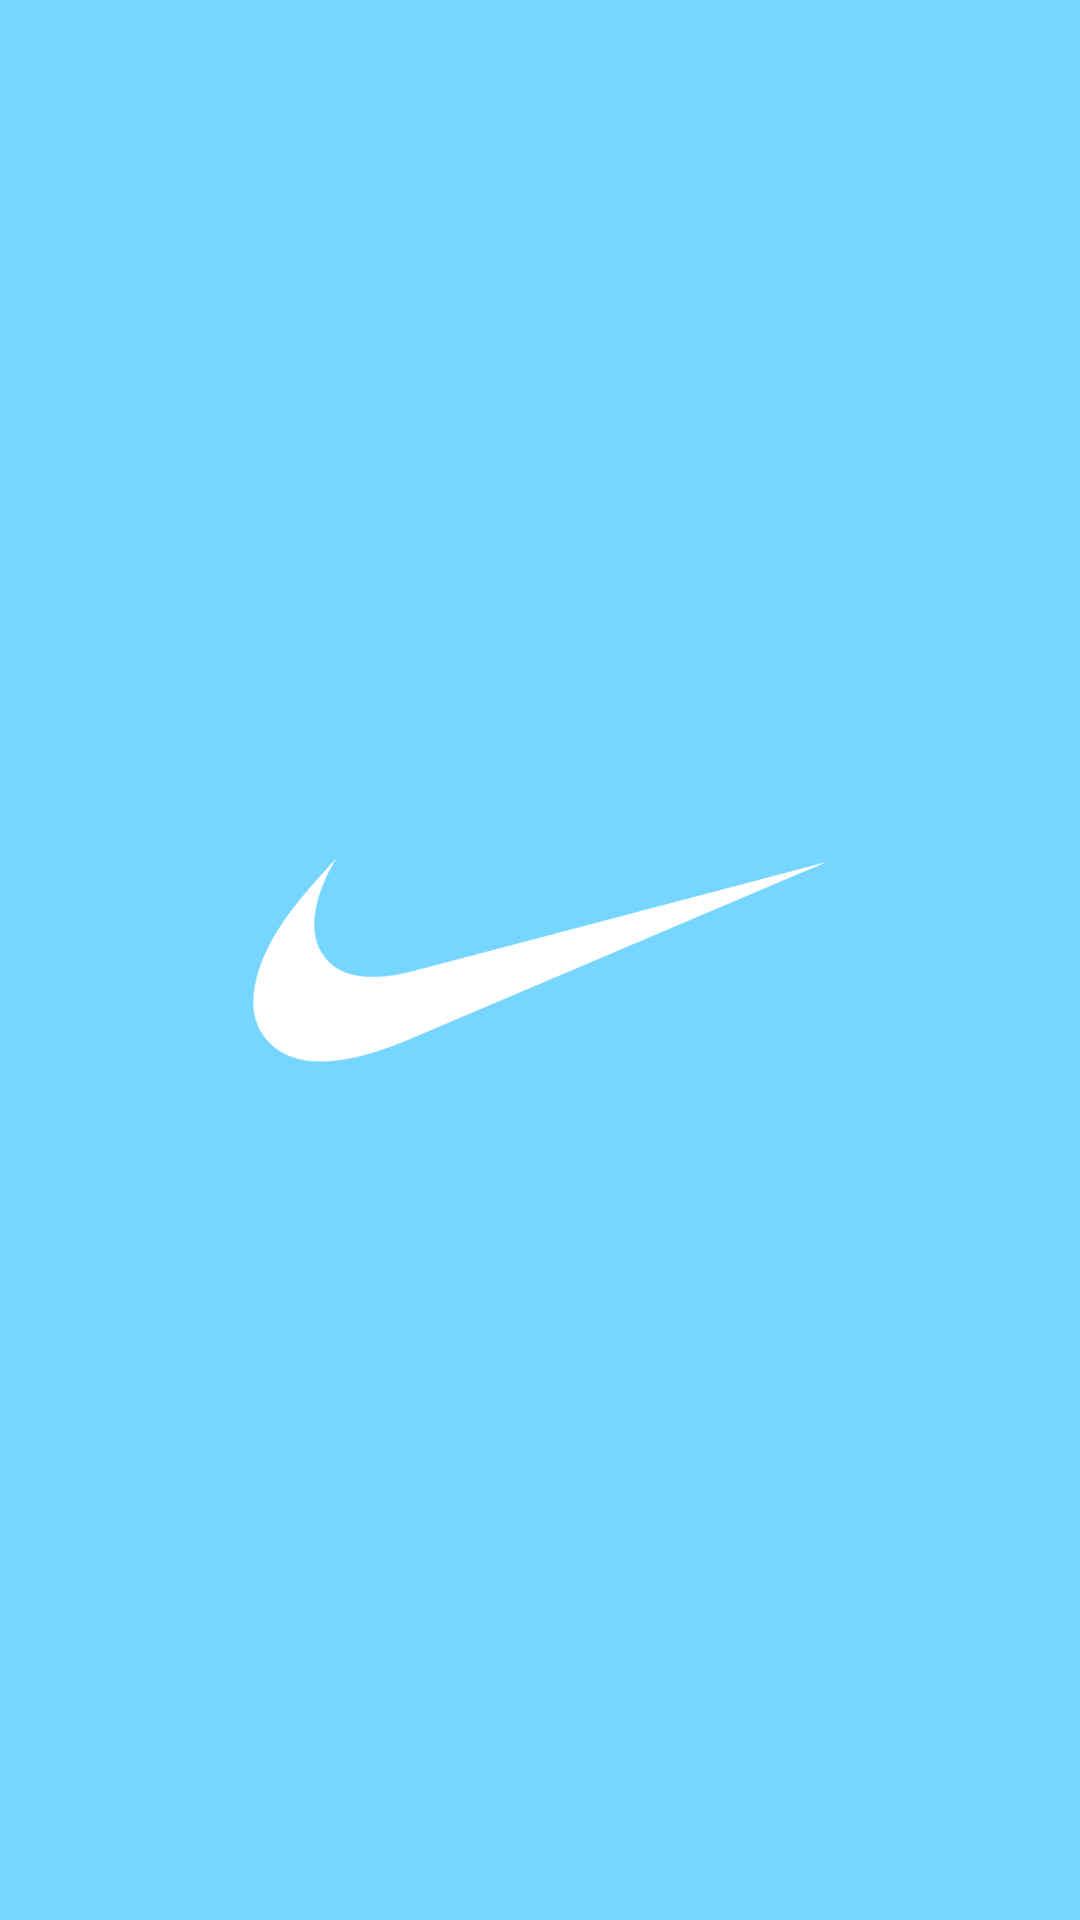 Logo7 2 >> ナイキロゴ/NIKE Logo12 iPhone壁紙  ただひたすらiPhoneの壁紙が集まるサイト